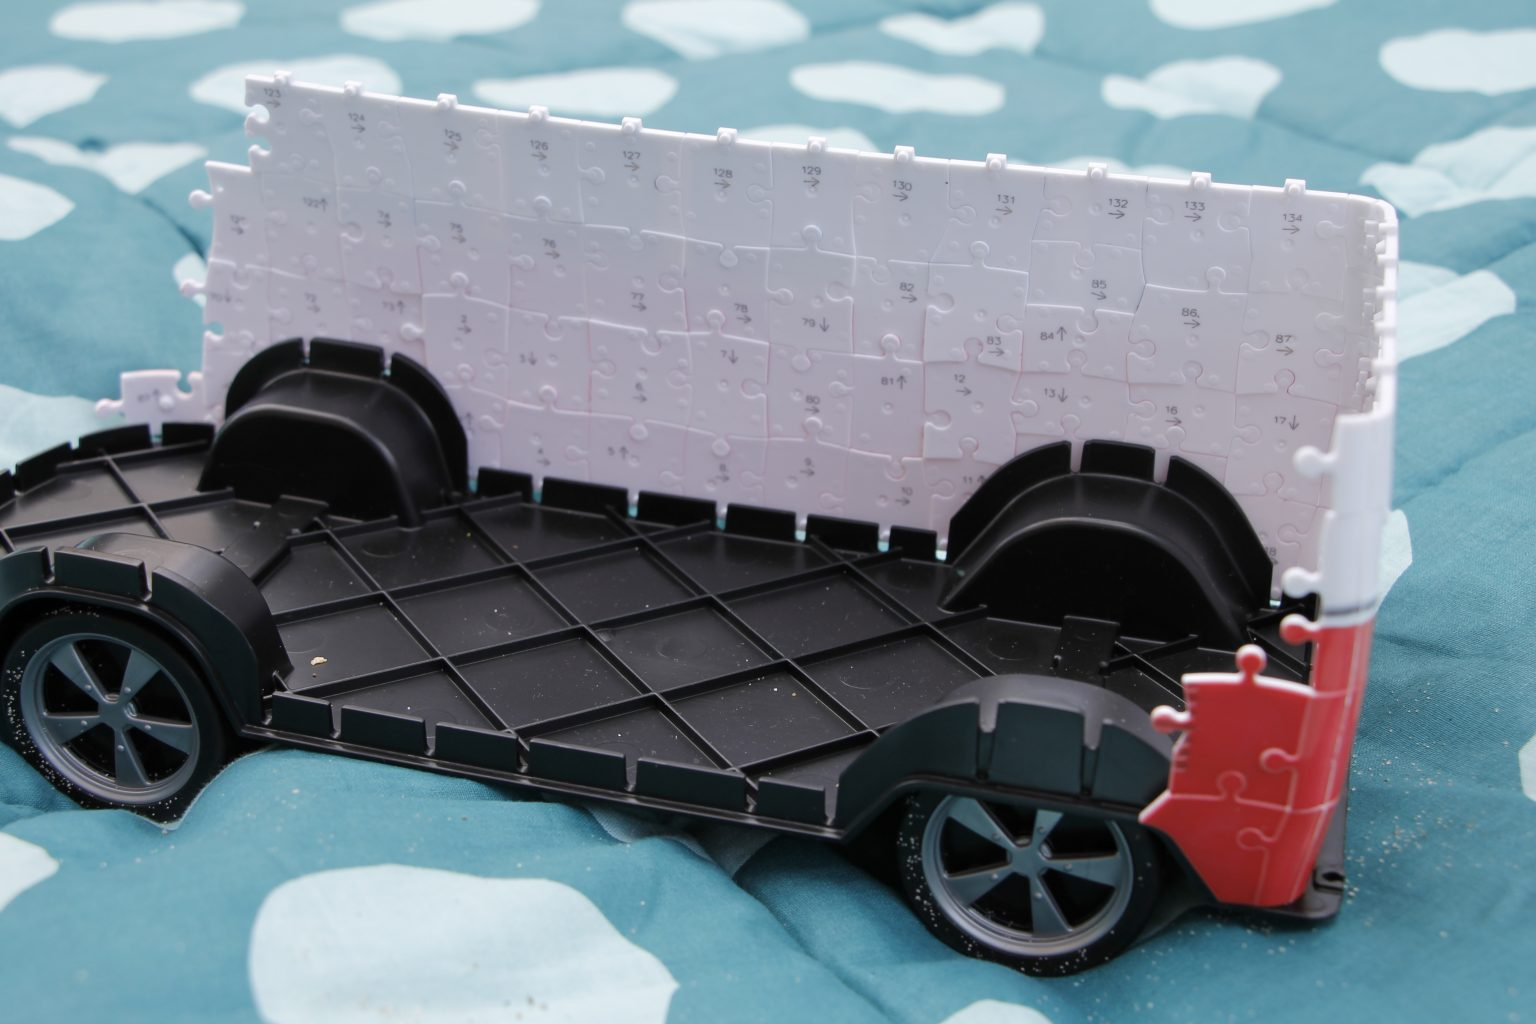 3D Puzzle Ravensburger Bulli Aufbau